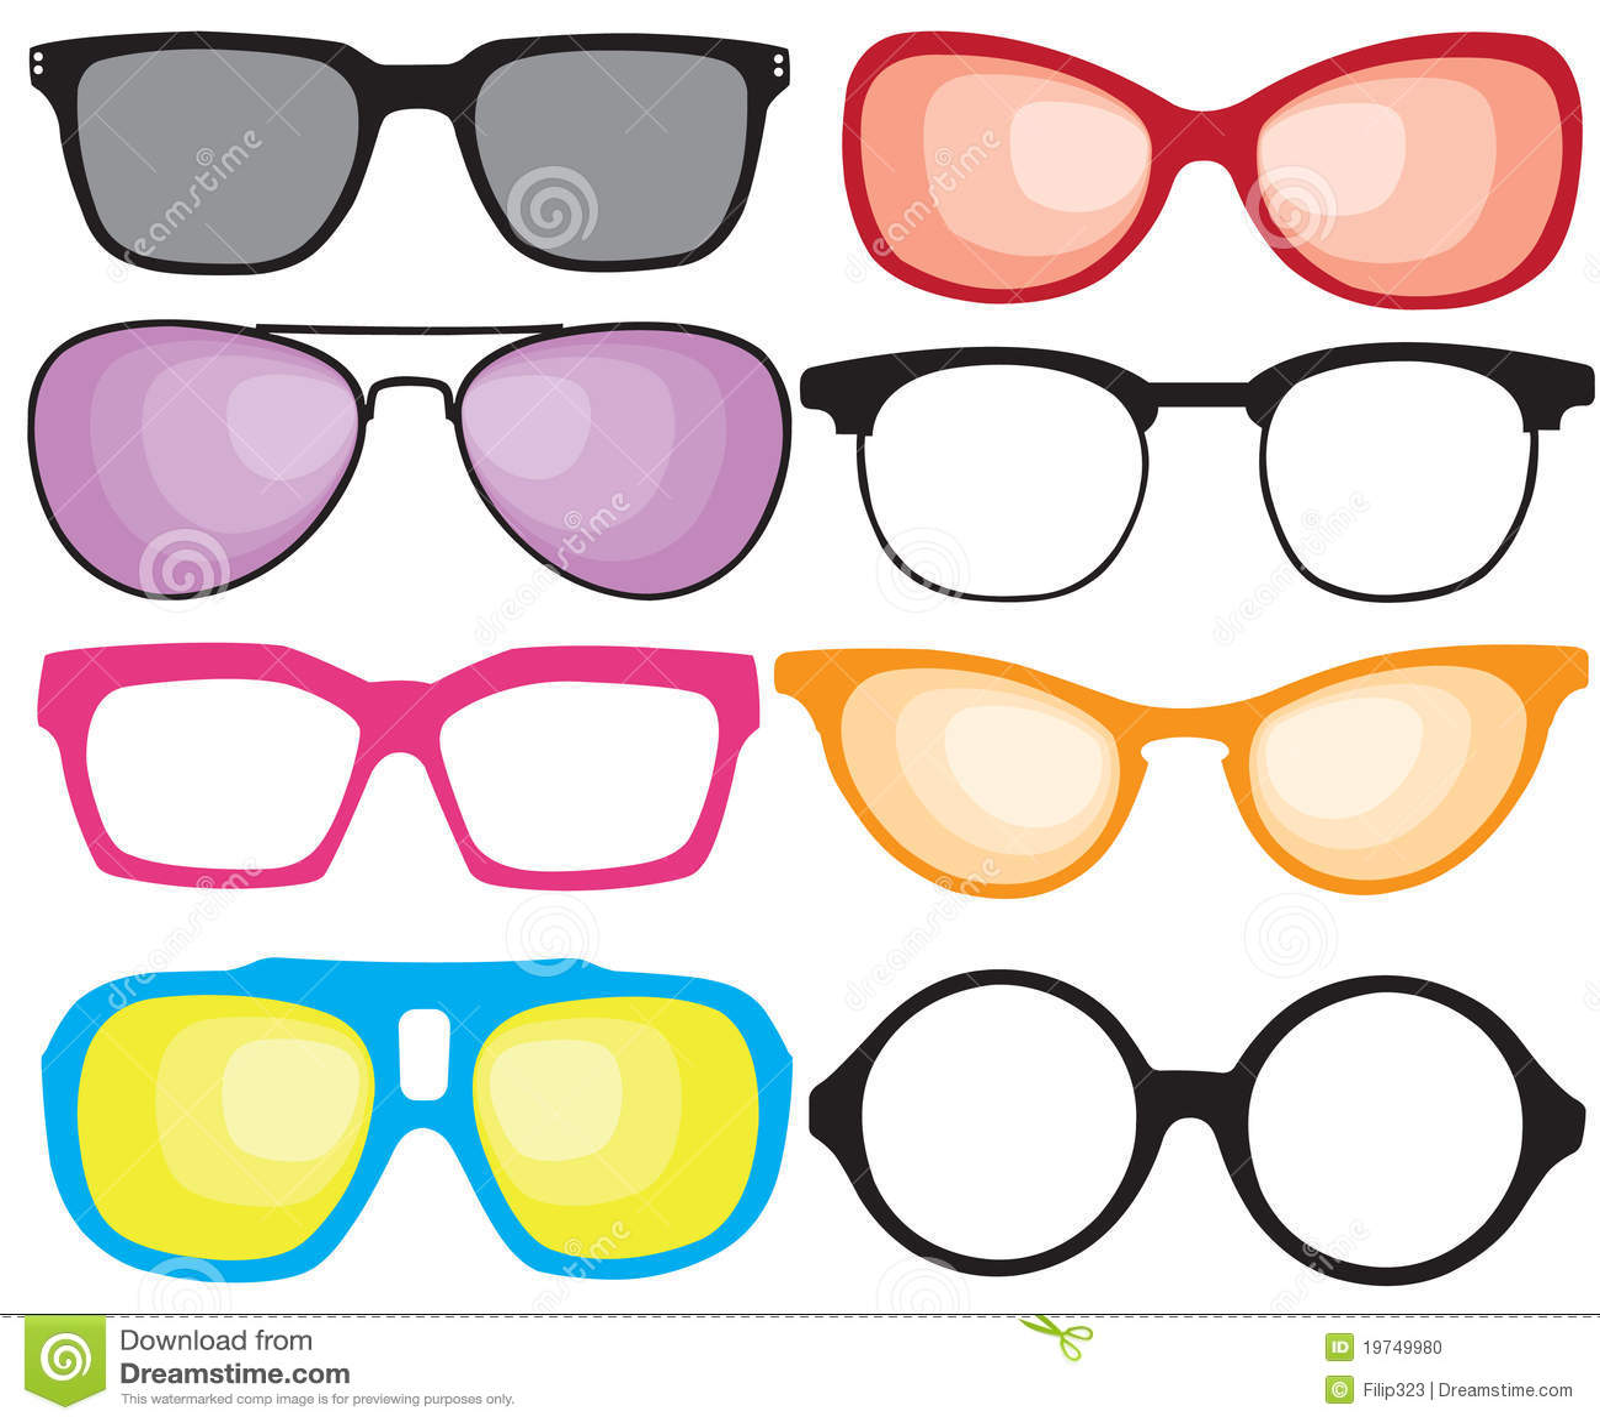 Retro sunglasses stock vector. Illustration of element ...